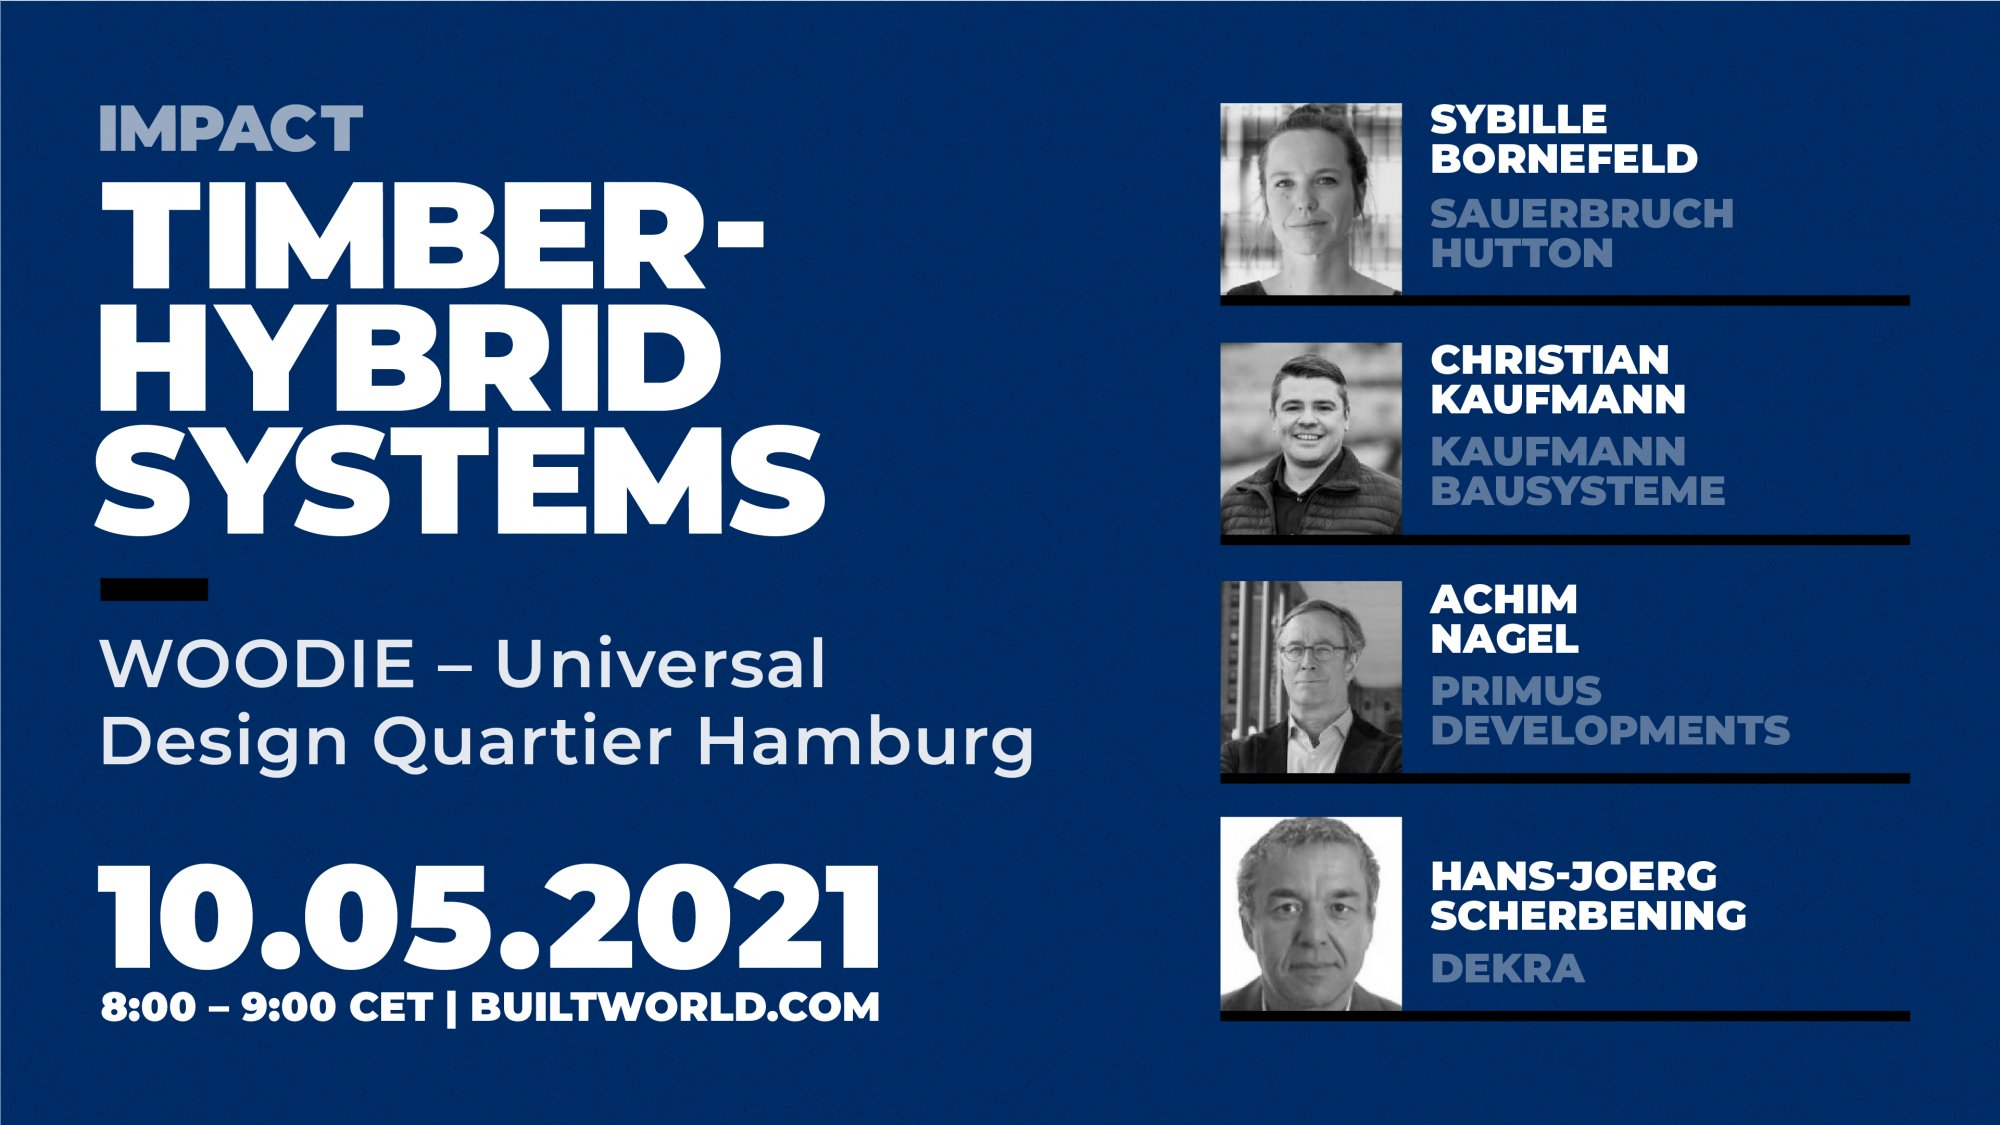 timber-hybrid-systems-woodie-universal-design-quartier-hamburg